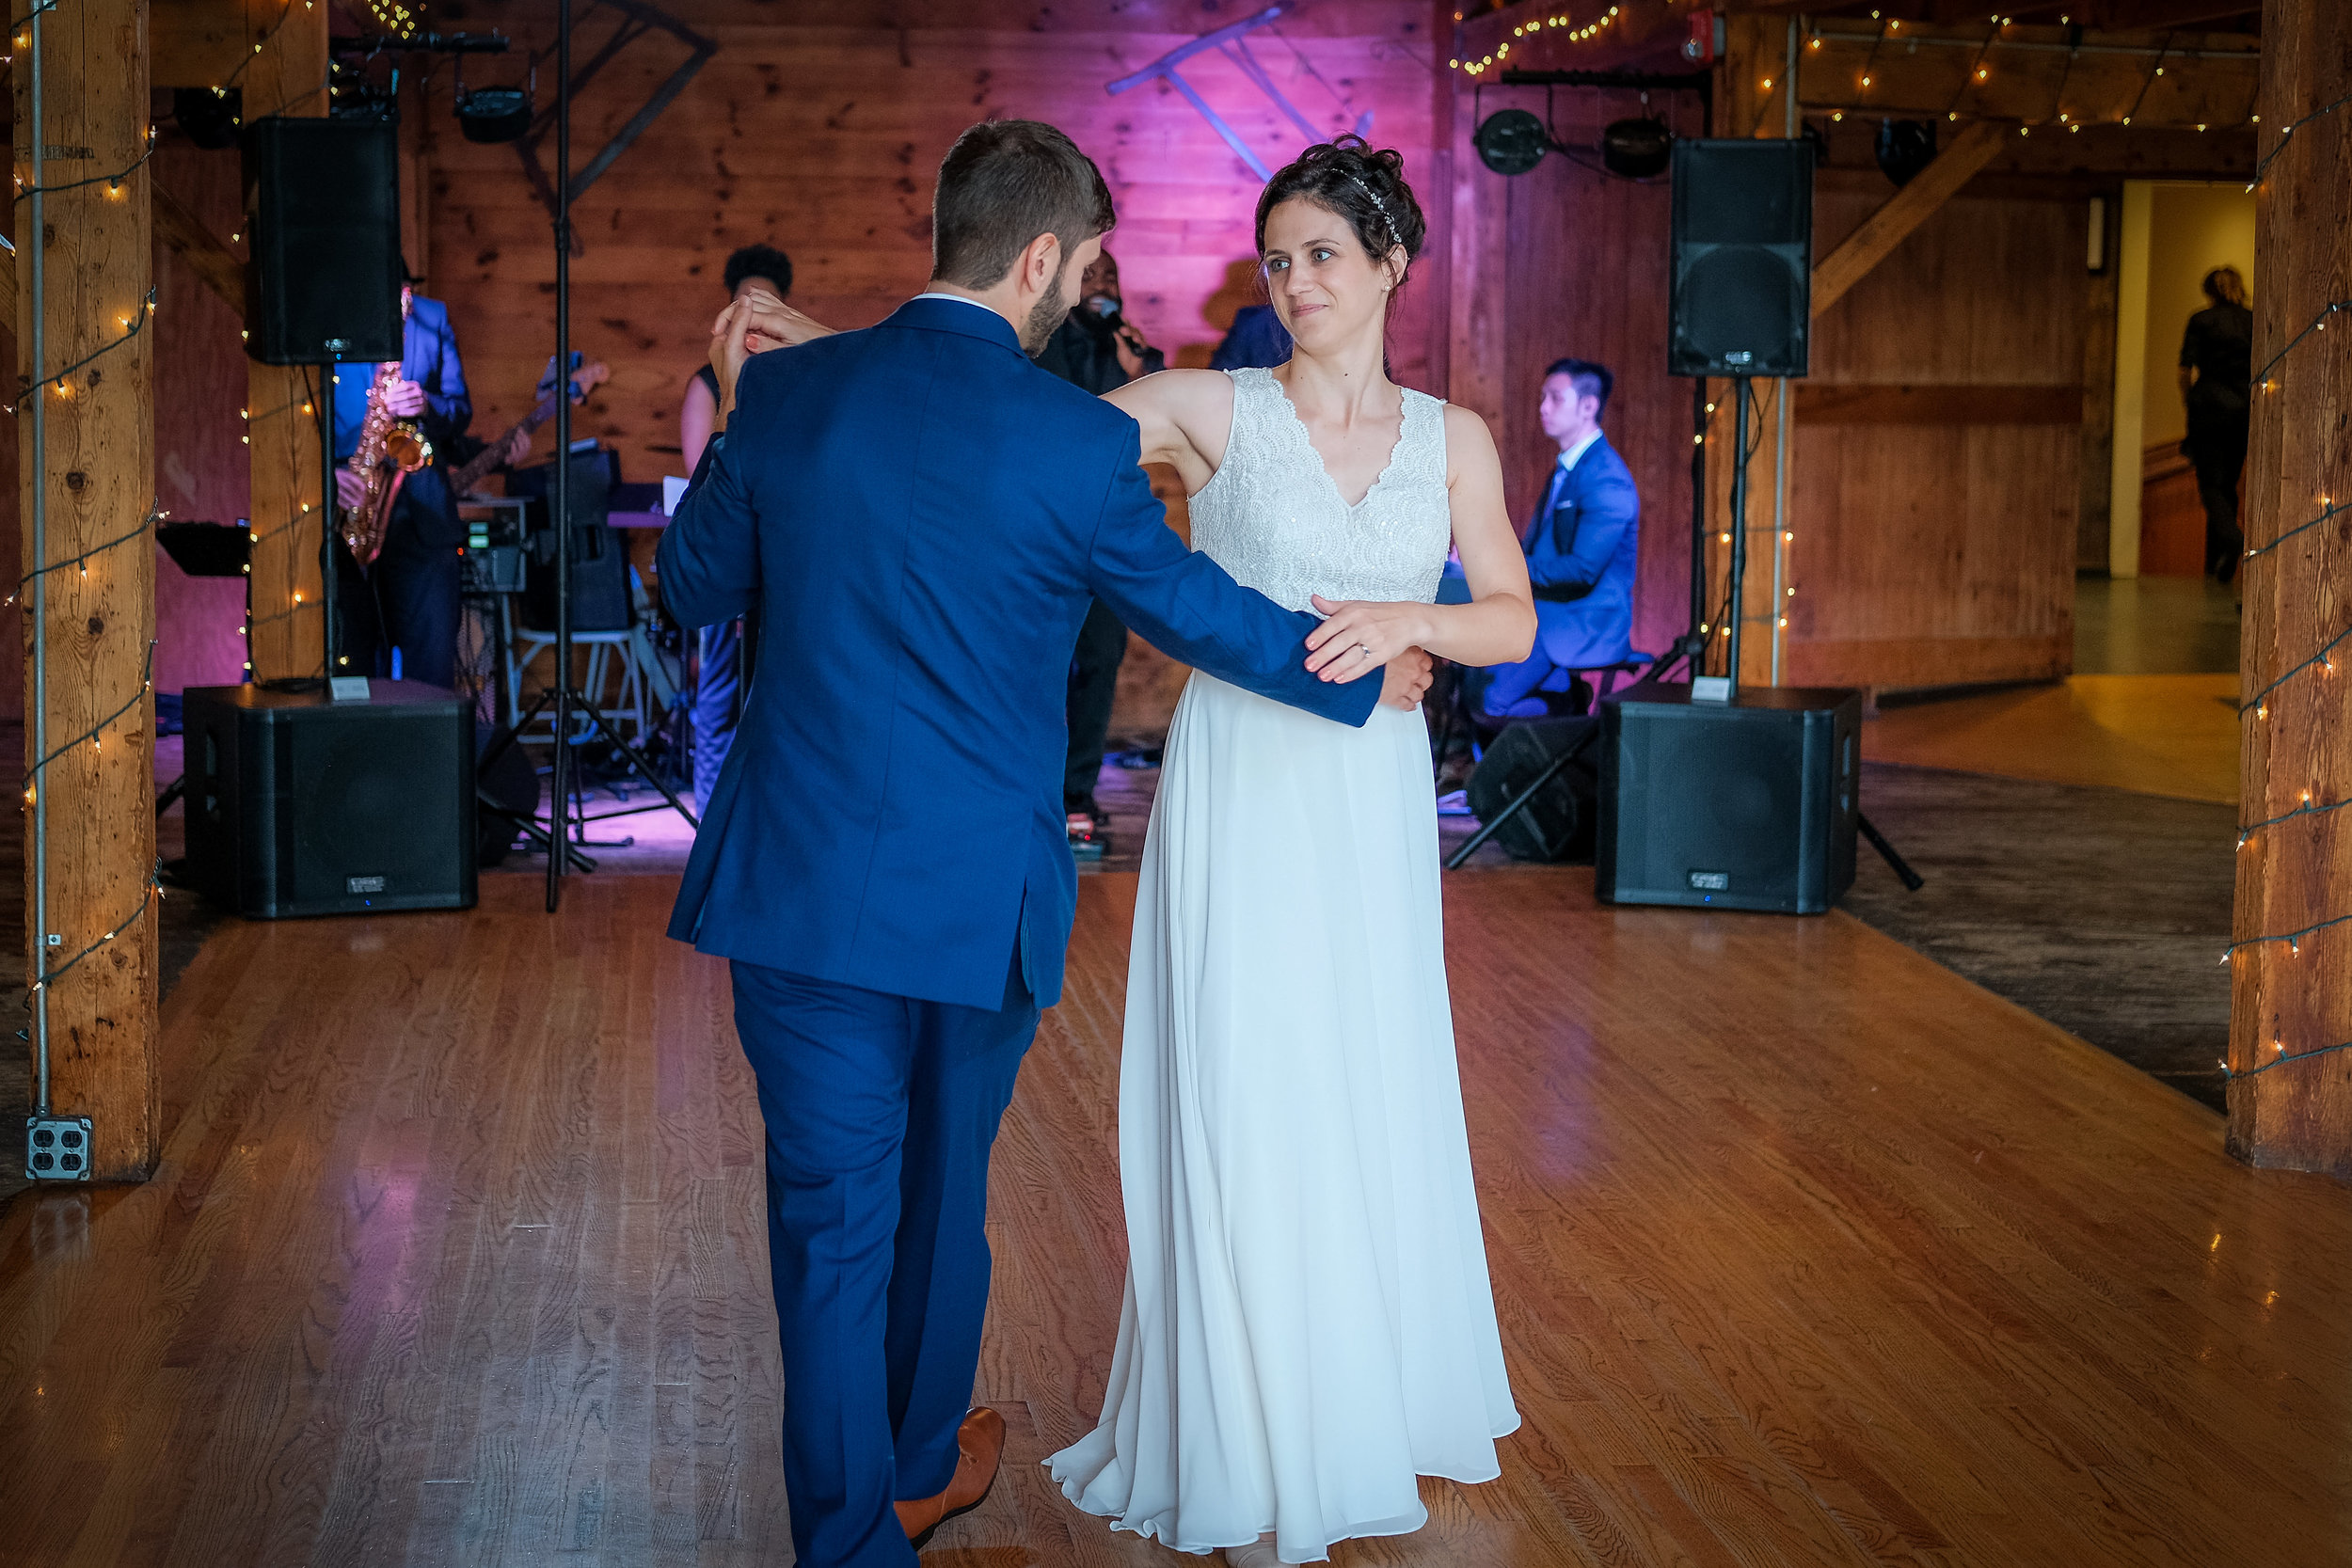 Peabody-Smith-Barn-Wedding-Photography-28.jpg